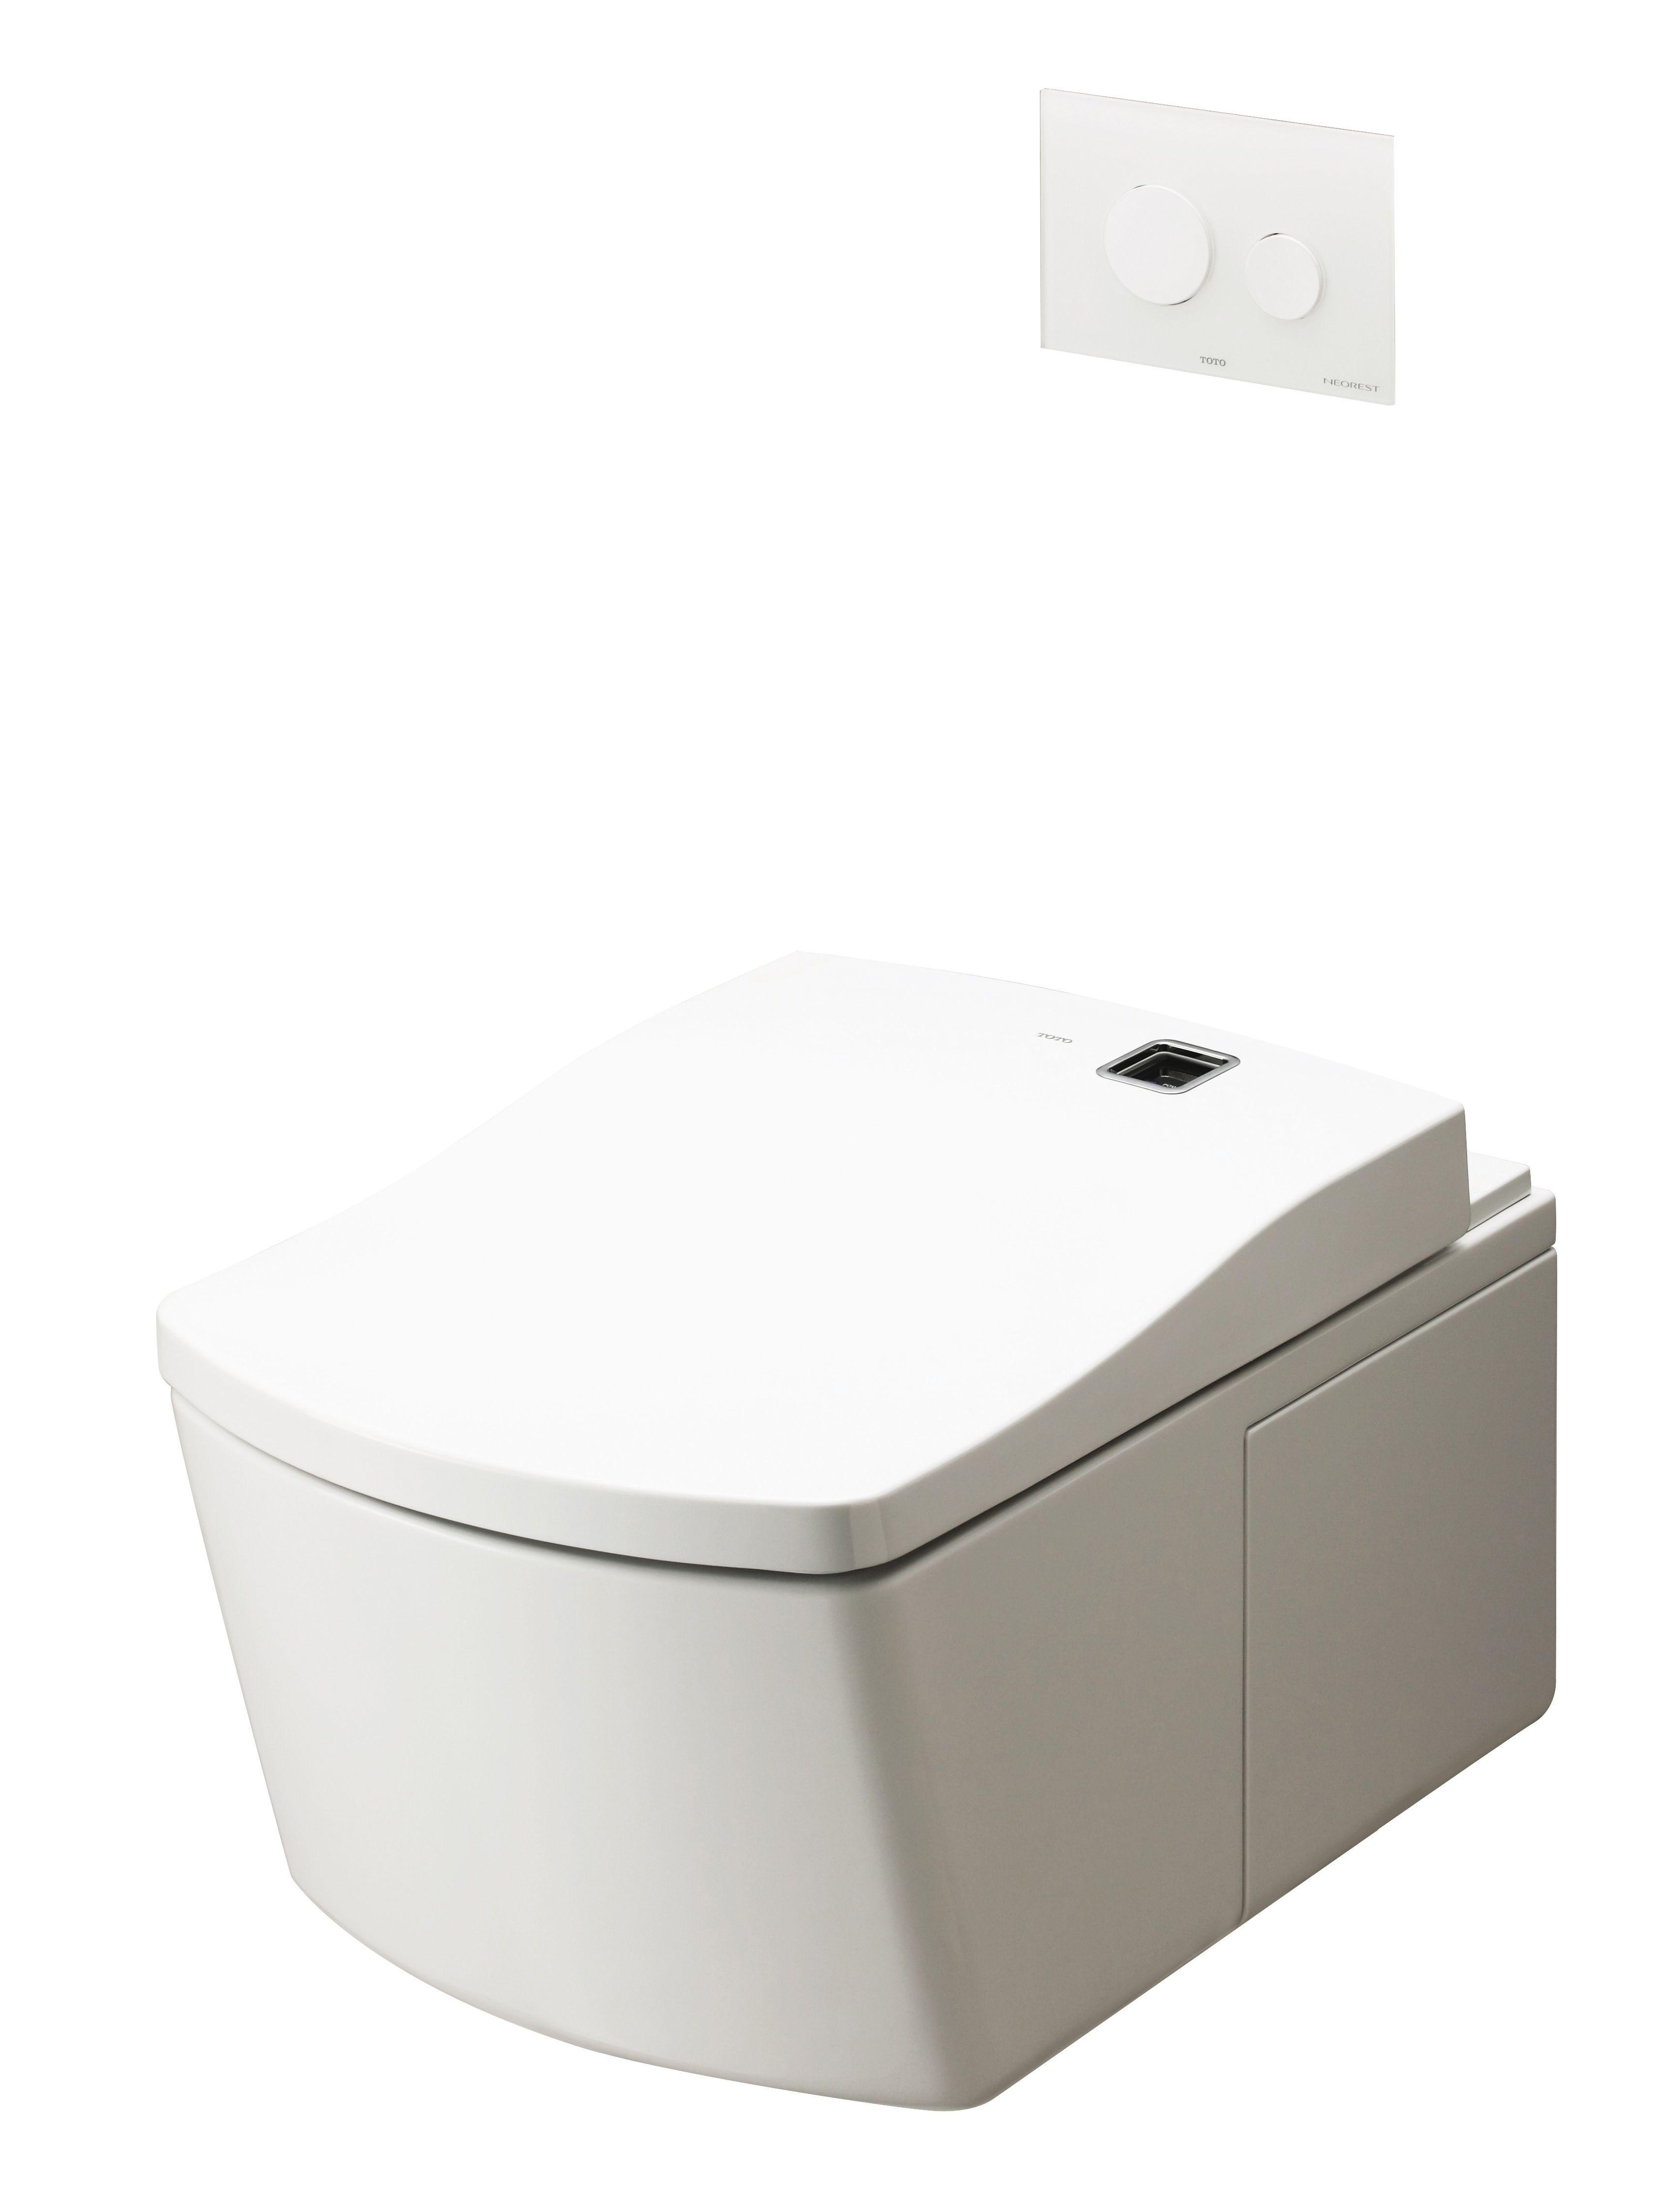 Toto Toilets Bidet Combo Bruin Blog